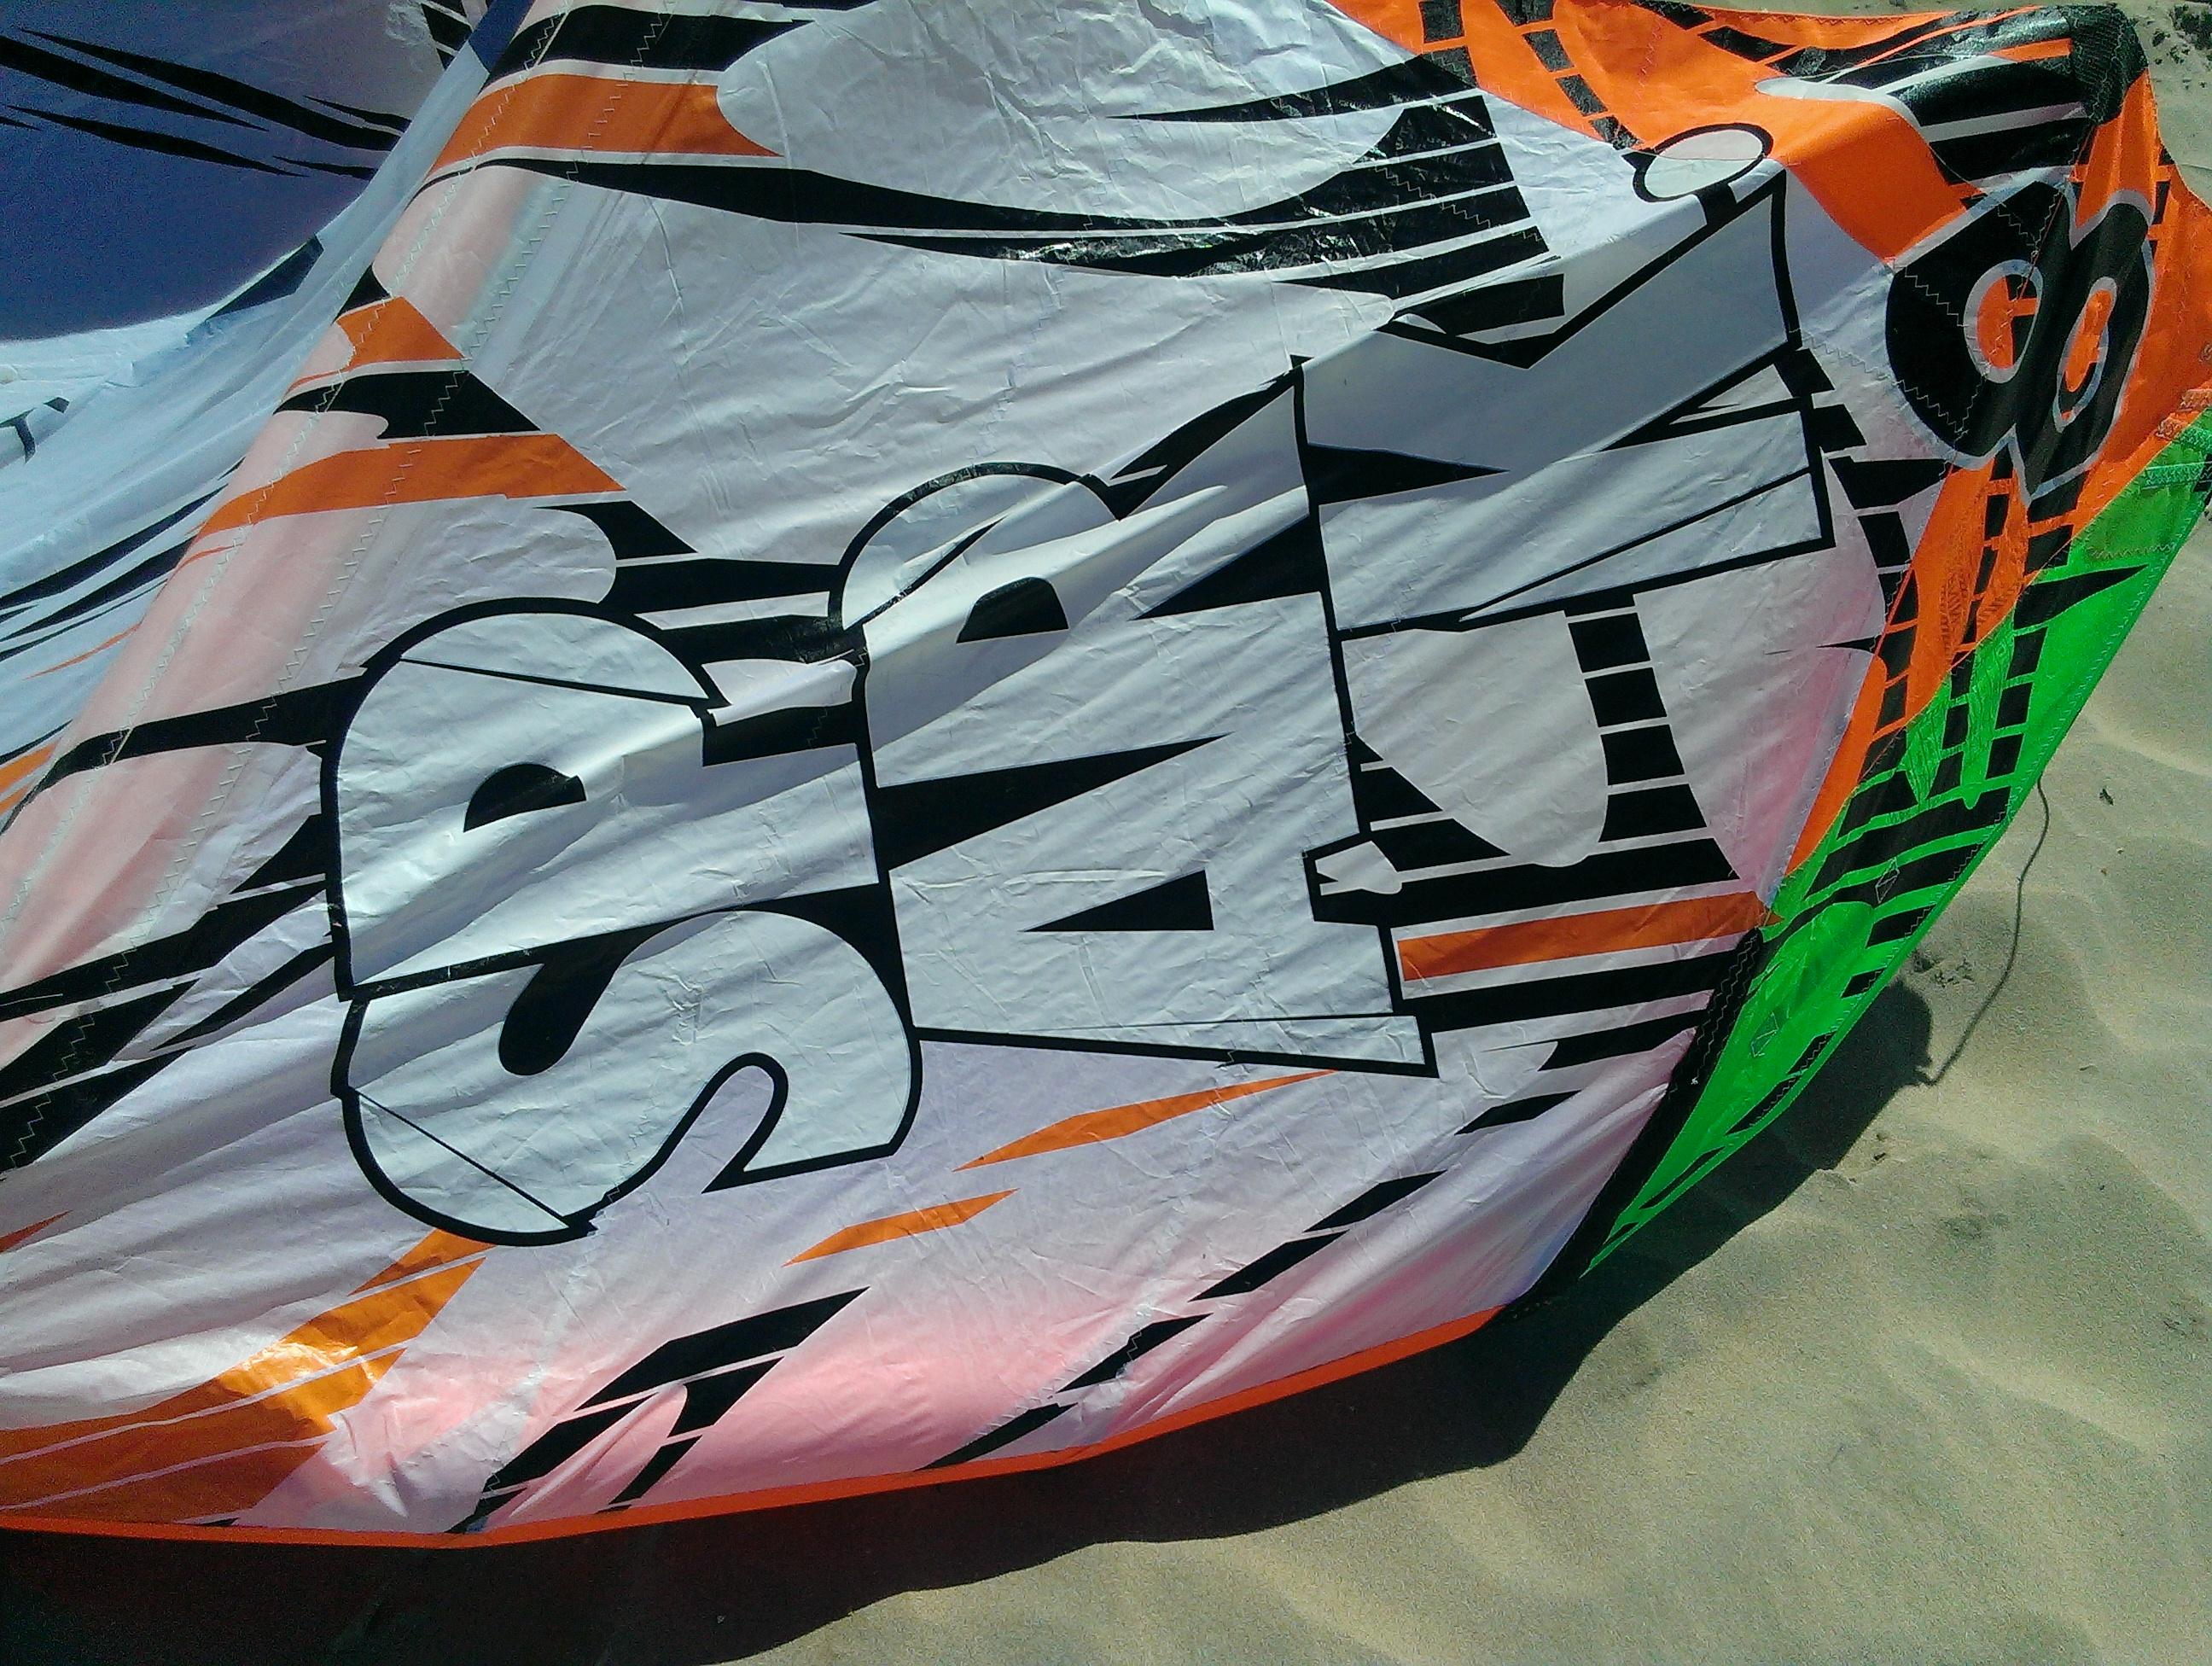 Gaastra Spark 8m 2015